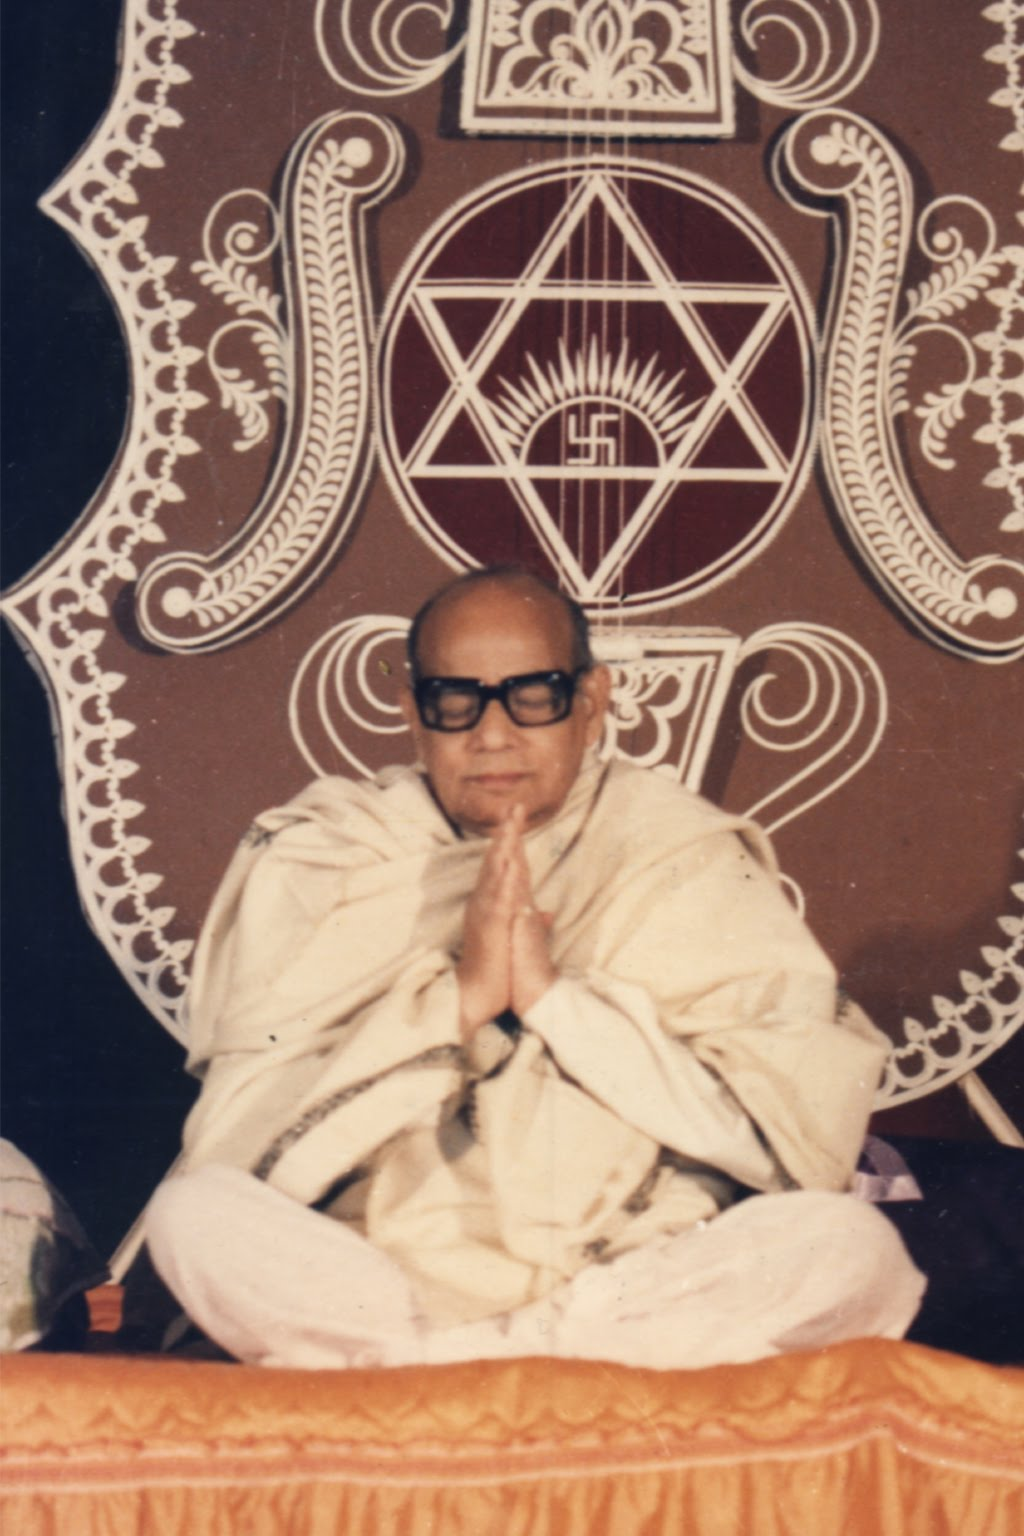 http://3.bp.blogspot.com/_KT0Tq6j74-4/S7-8Th4vi0I/AAAAAAAAAEc/x3_P-0KY7hM/s1600/Baba-Namaskar.jpg